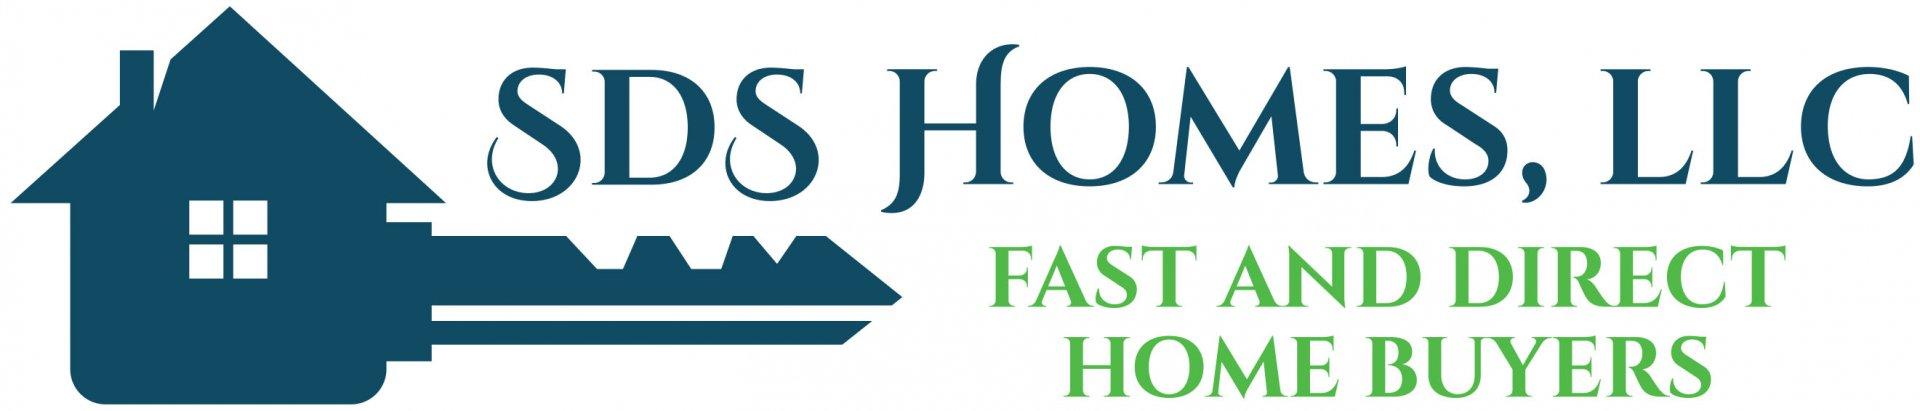 SDS HOMES, LLC  logo